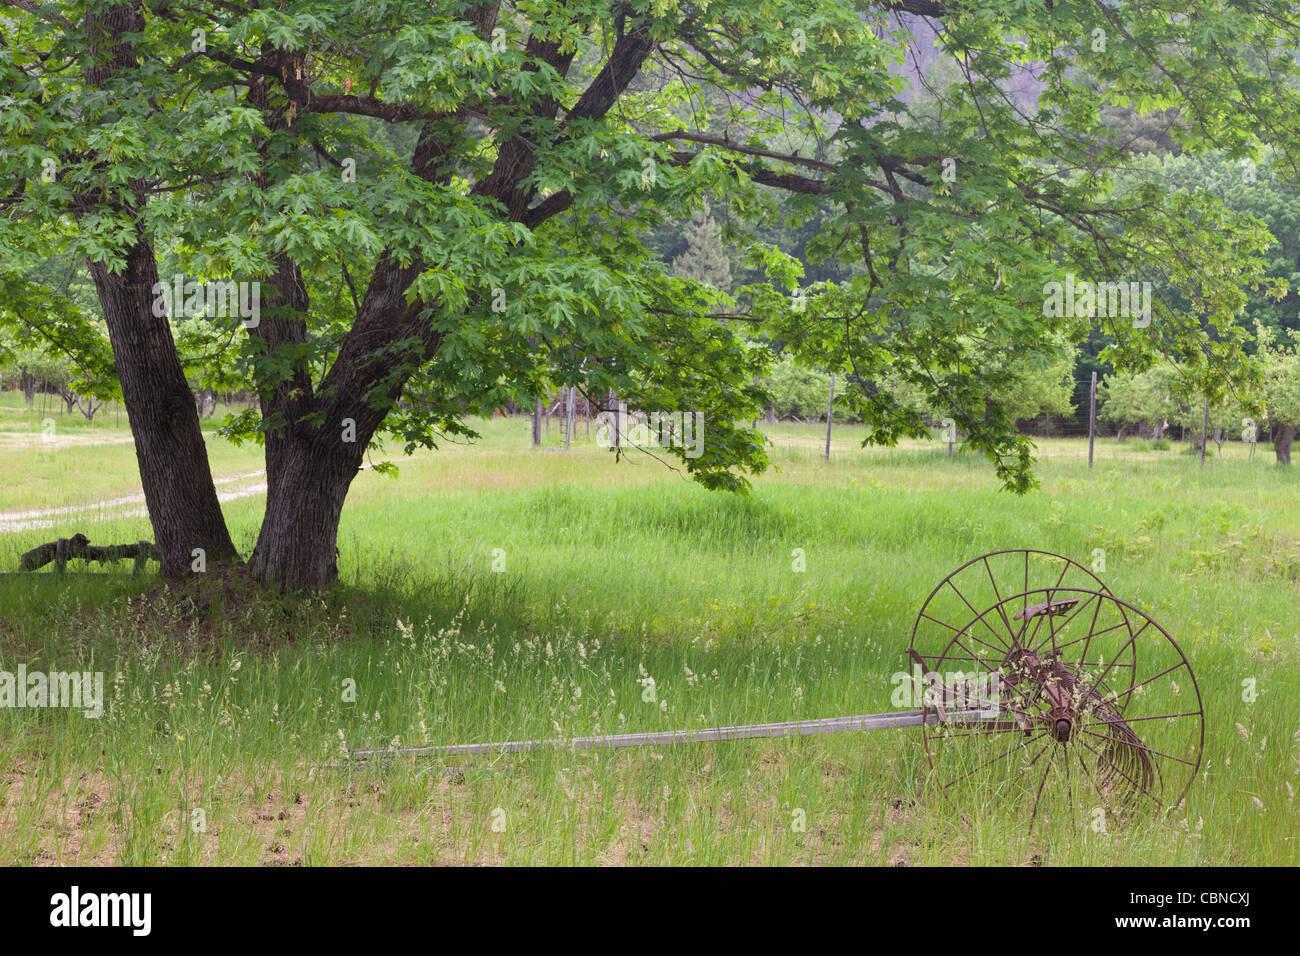 Farm field, Historic Buckner Orchard and Homestead North Cascades National Park, Washington - Stock Image